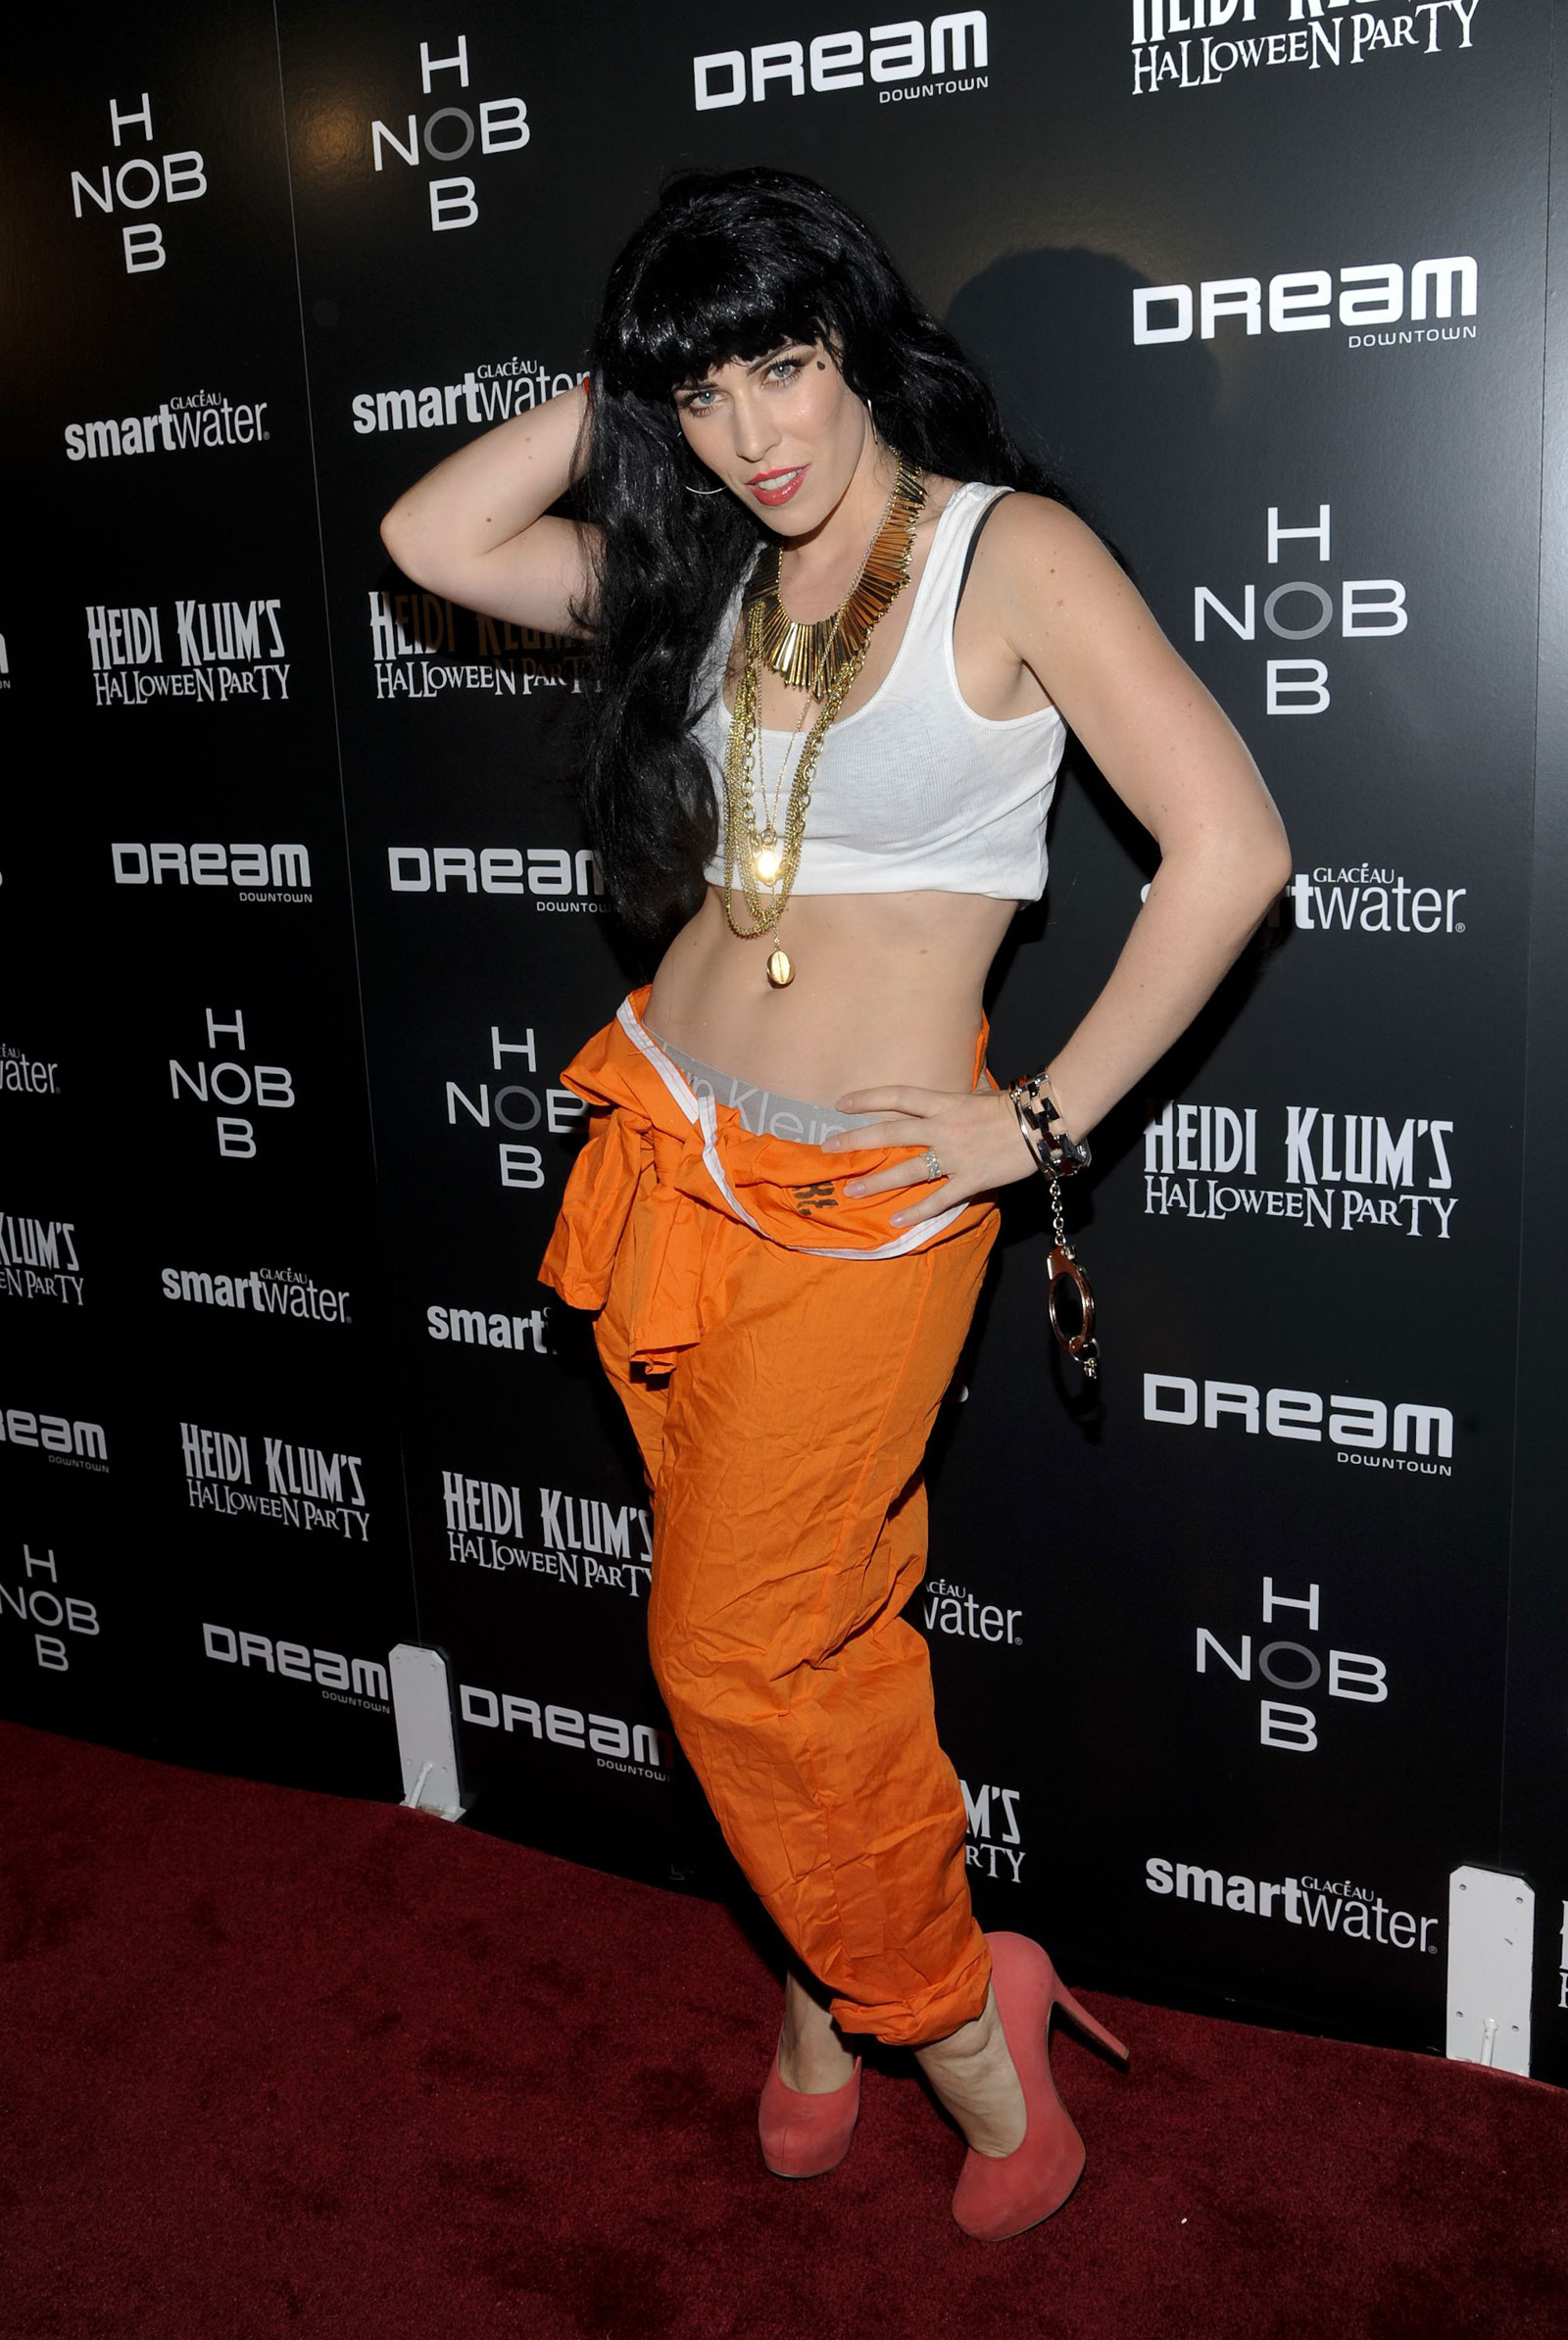 Natasha Bedingfield at Heidi Klum's Halloween Party in New York ...